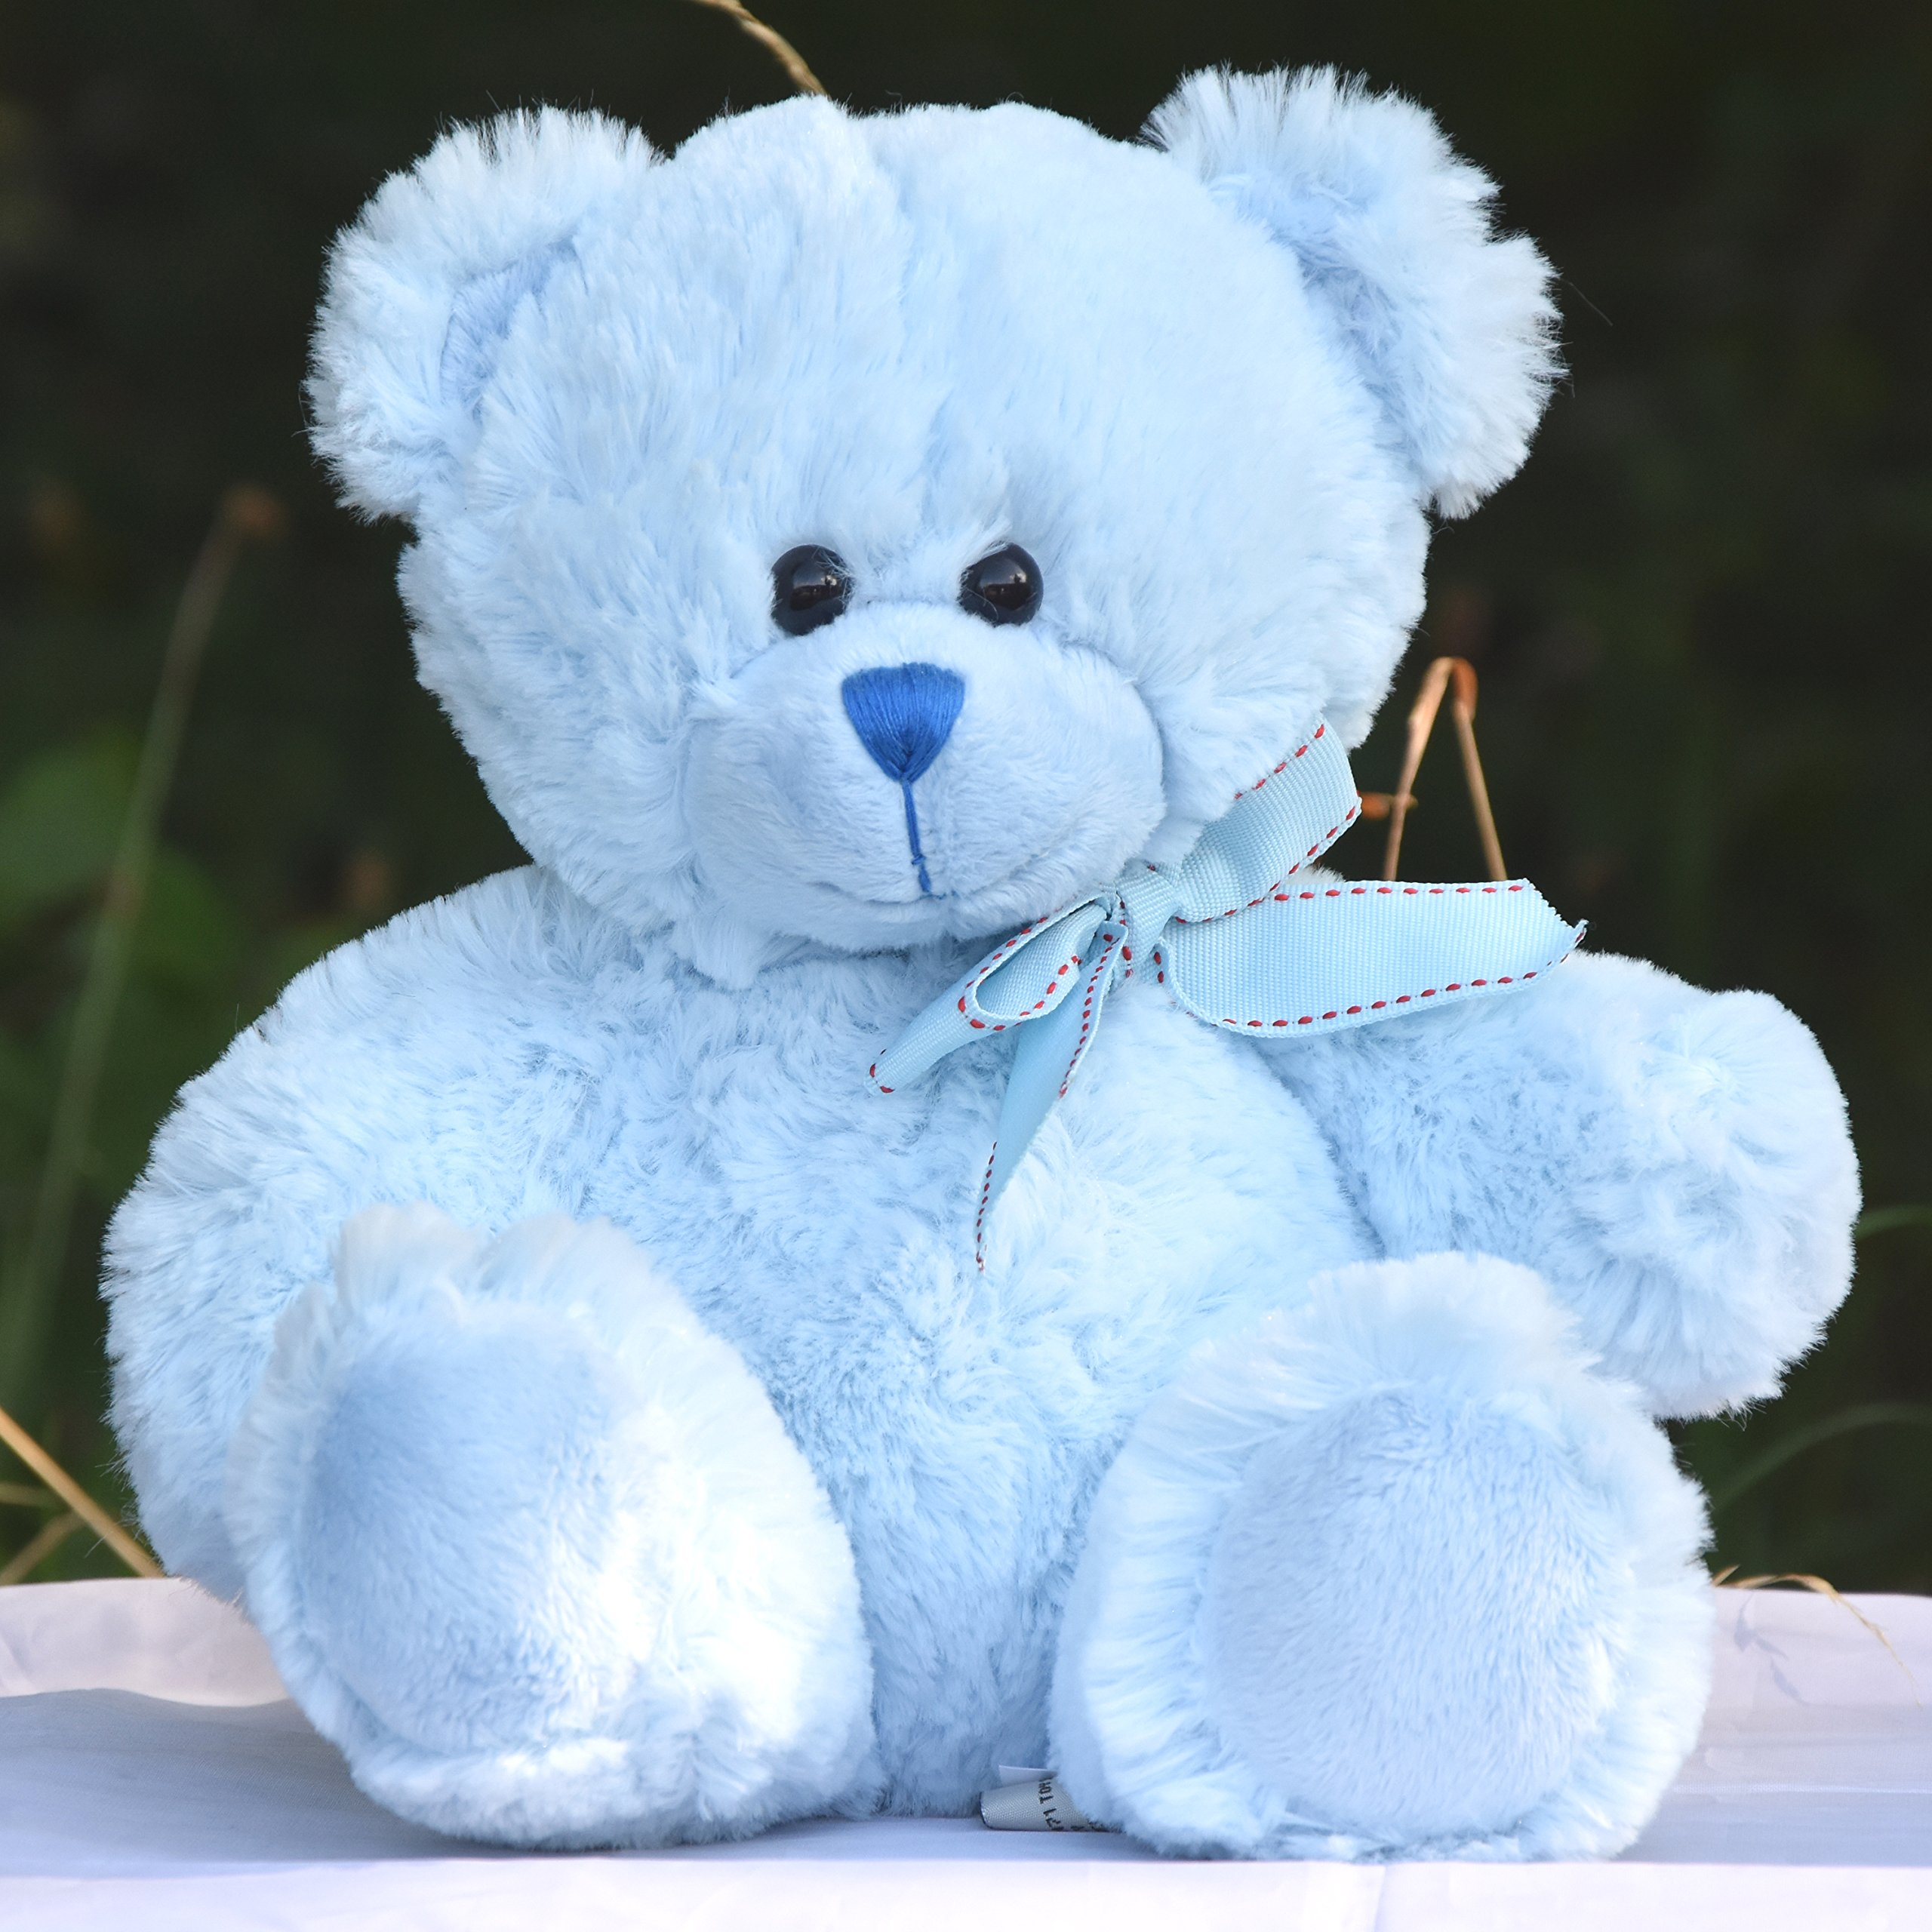 Suki Baby Hug-a-Boo Super Soft Plush Musical Sleeping Bear with Soft Boa Blankie Pink